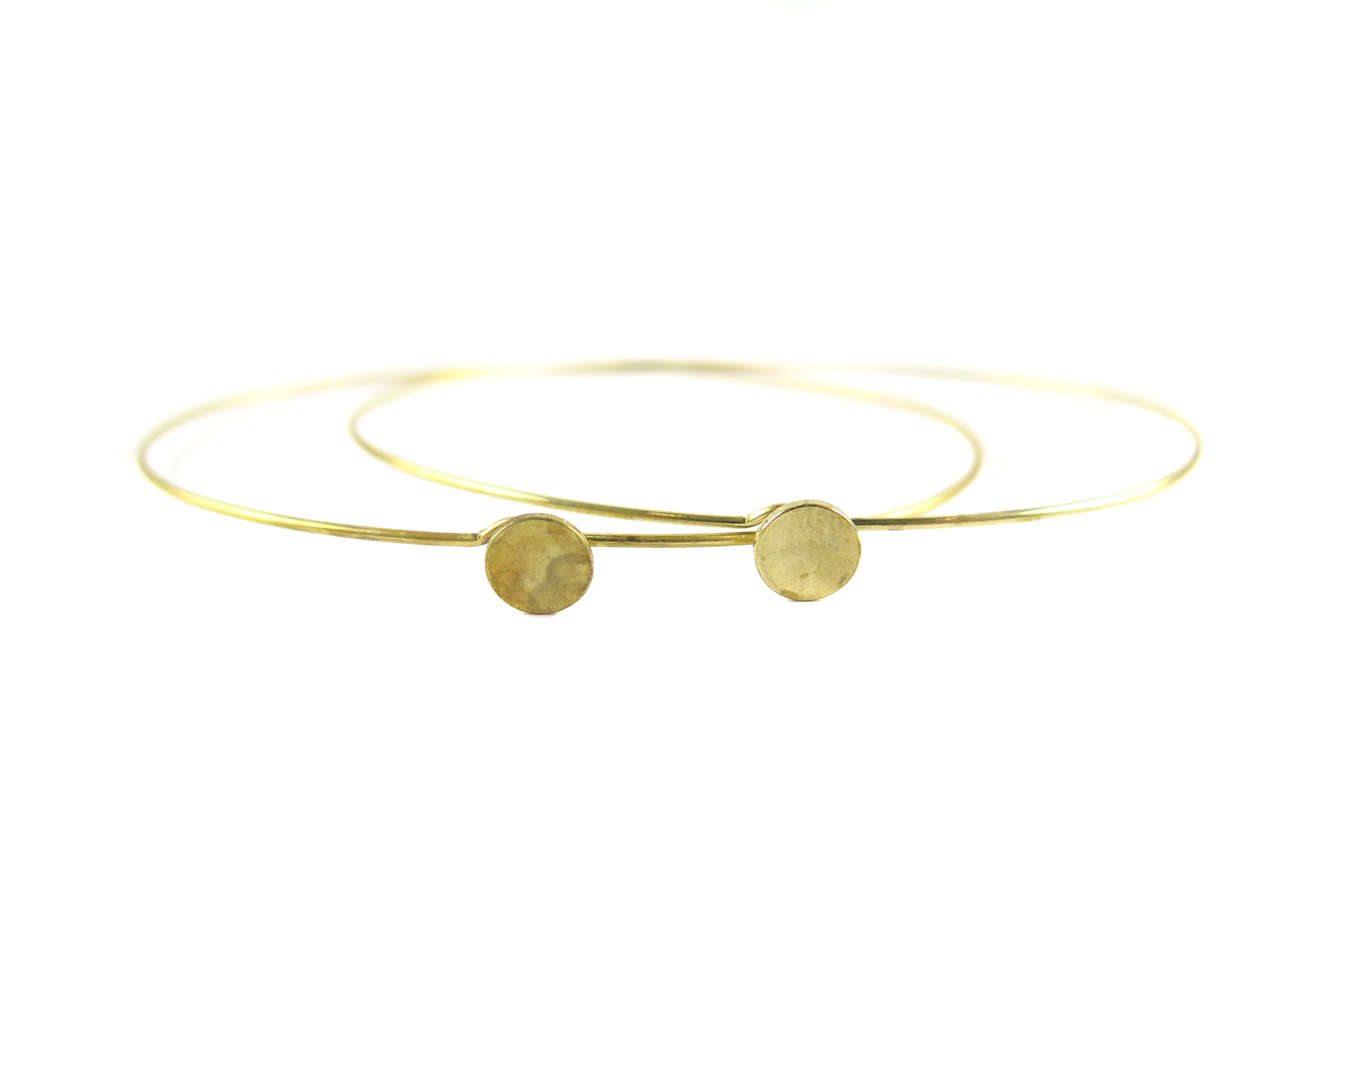 K416-B 2x Rhodium Plated Dainty Circle Engraving  Glue Wire Bracelet